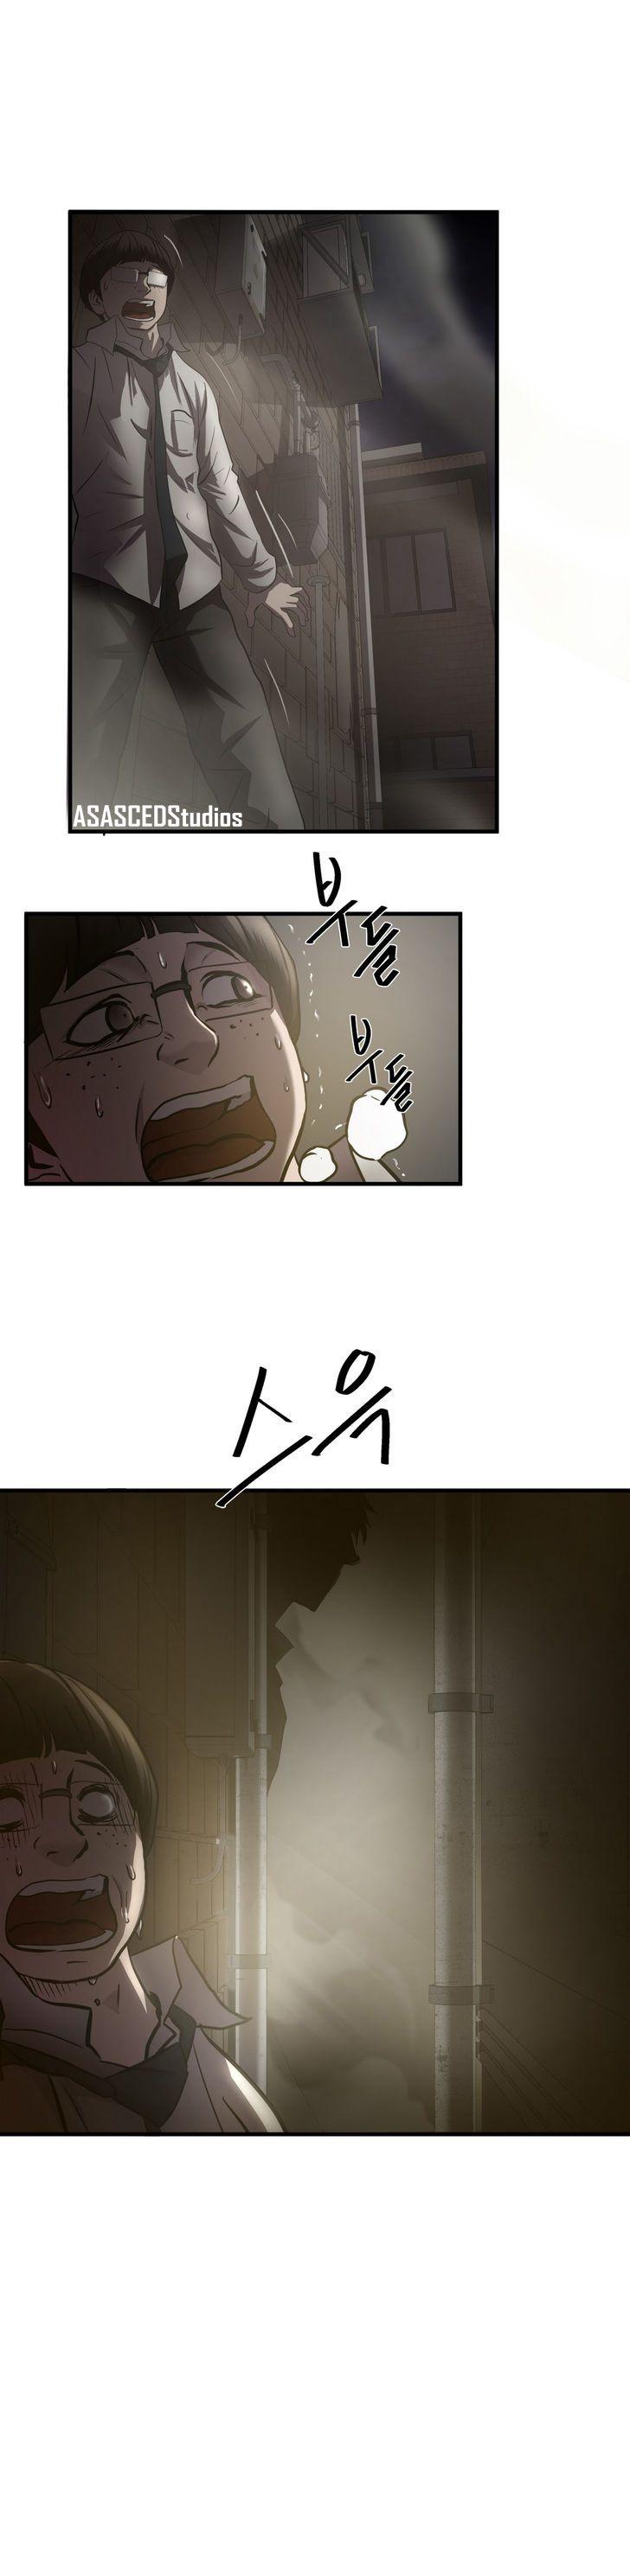 https://c5.ninemanga.com/es_manga/pic2/58/19386/503865/cd2992dd46ac50978482d83c7f510331.jpg Page 4